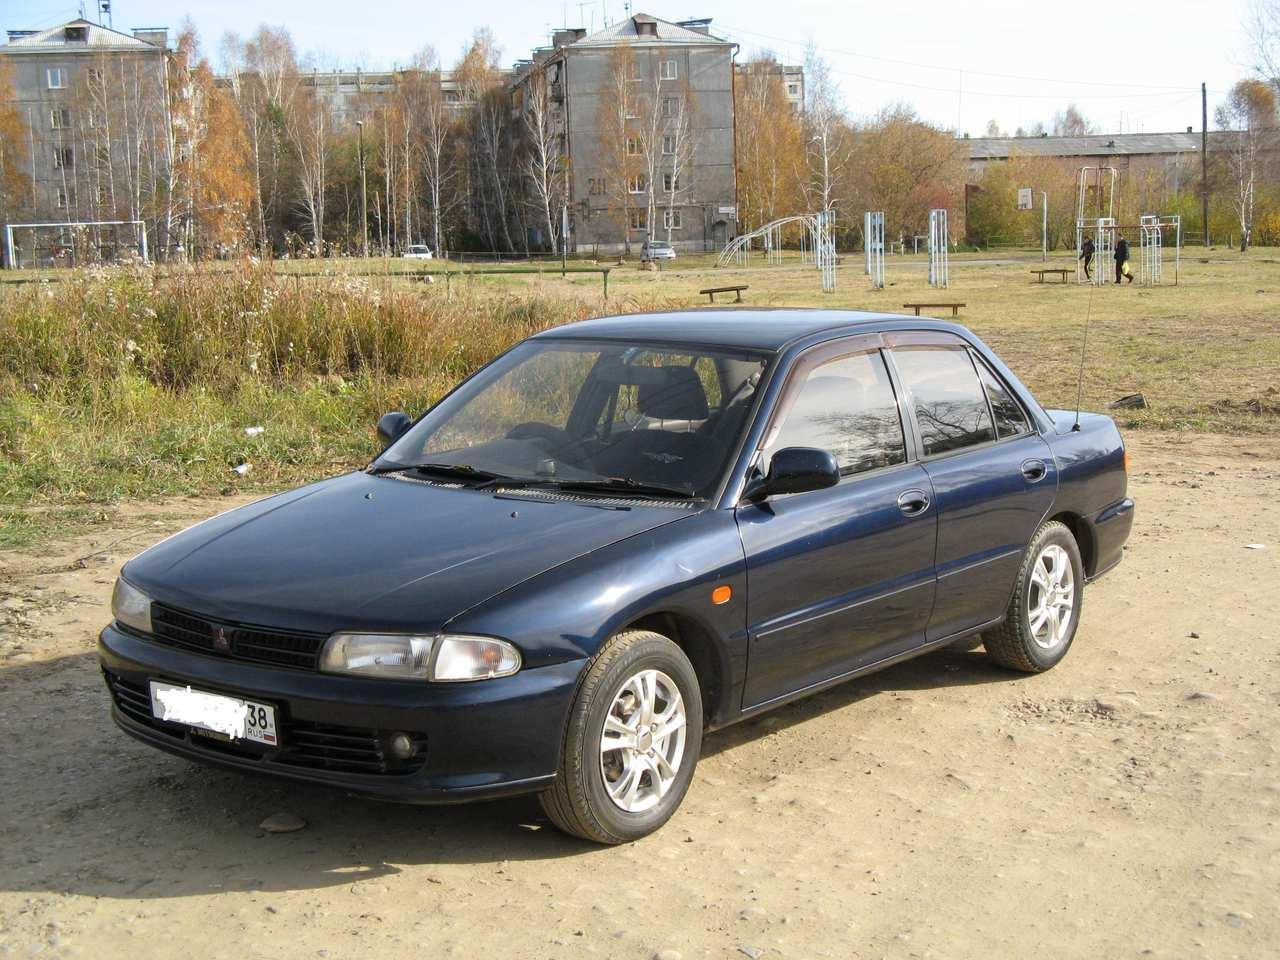 1994 Mitsubishi Lancer Photos, Gasoline, FF, Automatic For Sale